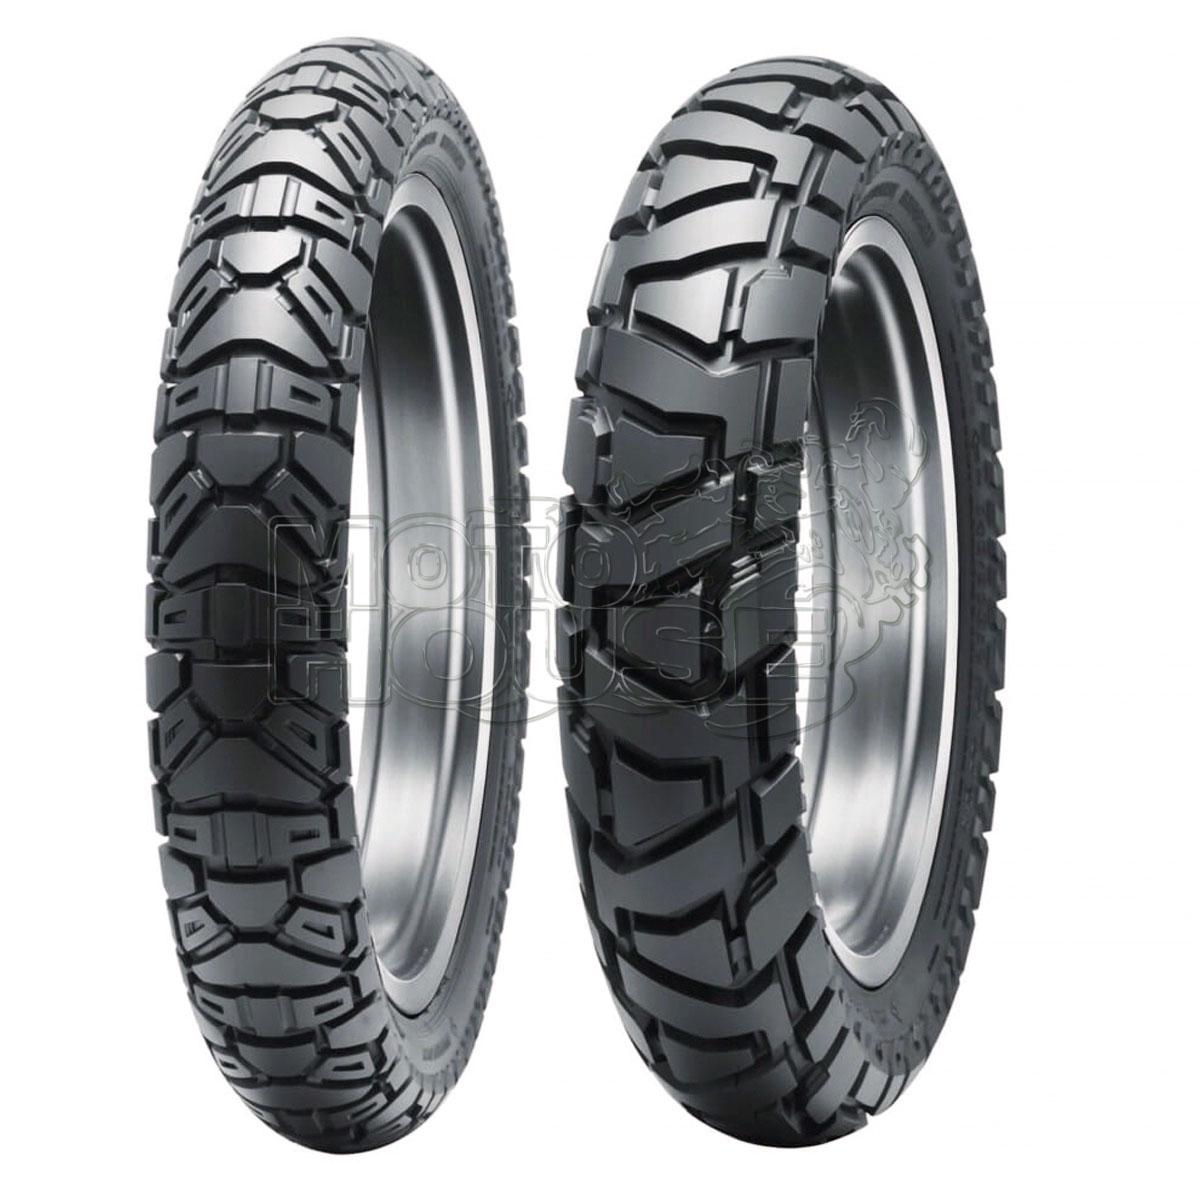 Llanta P/ Moto Dunlop Trailmax Mission 170/60-17 72t